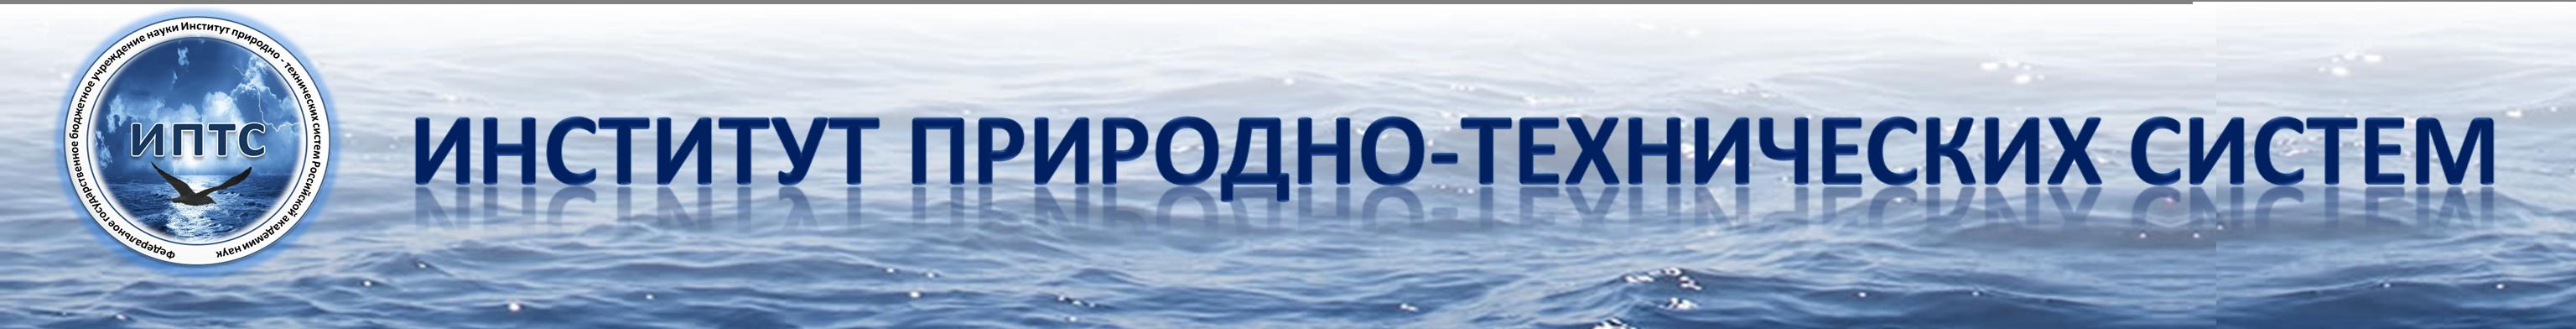 ФГБНУ ИПТС РФ, 299011 Севастополь ул. Ленина д. 28